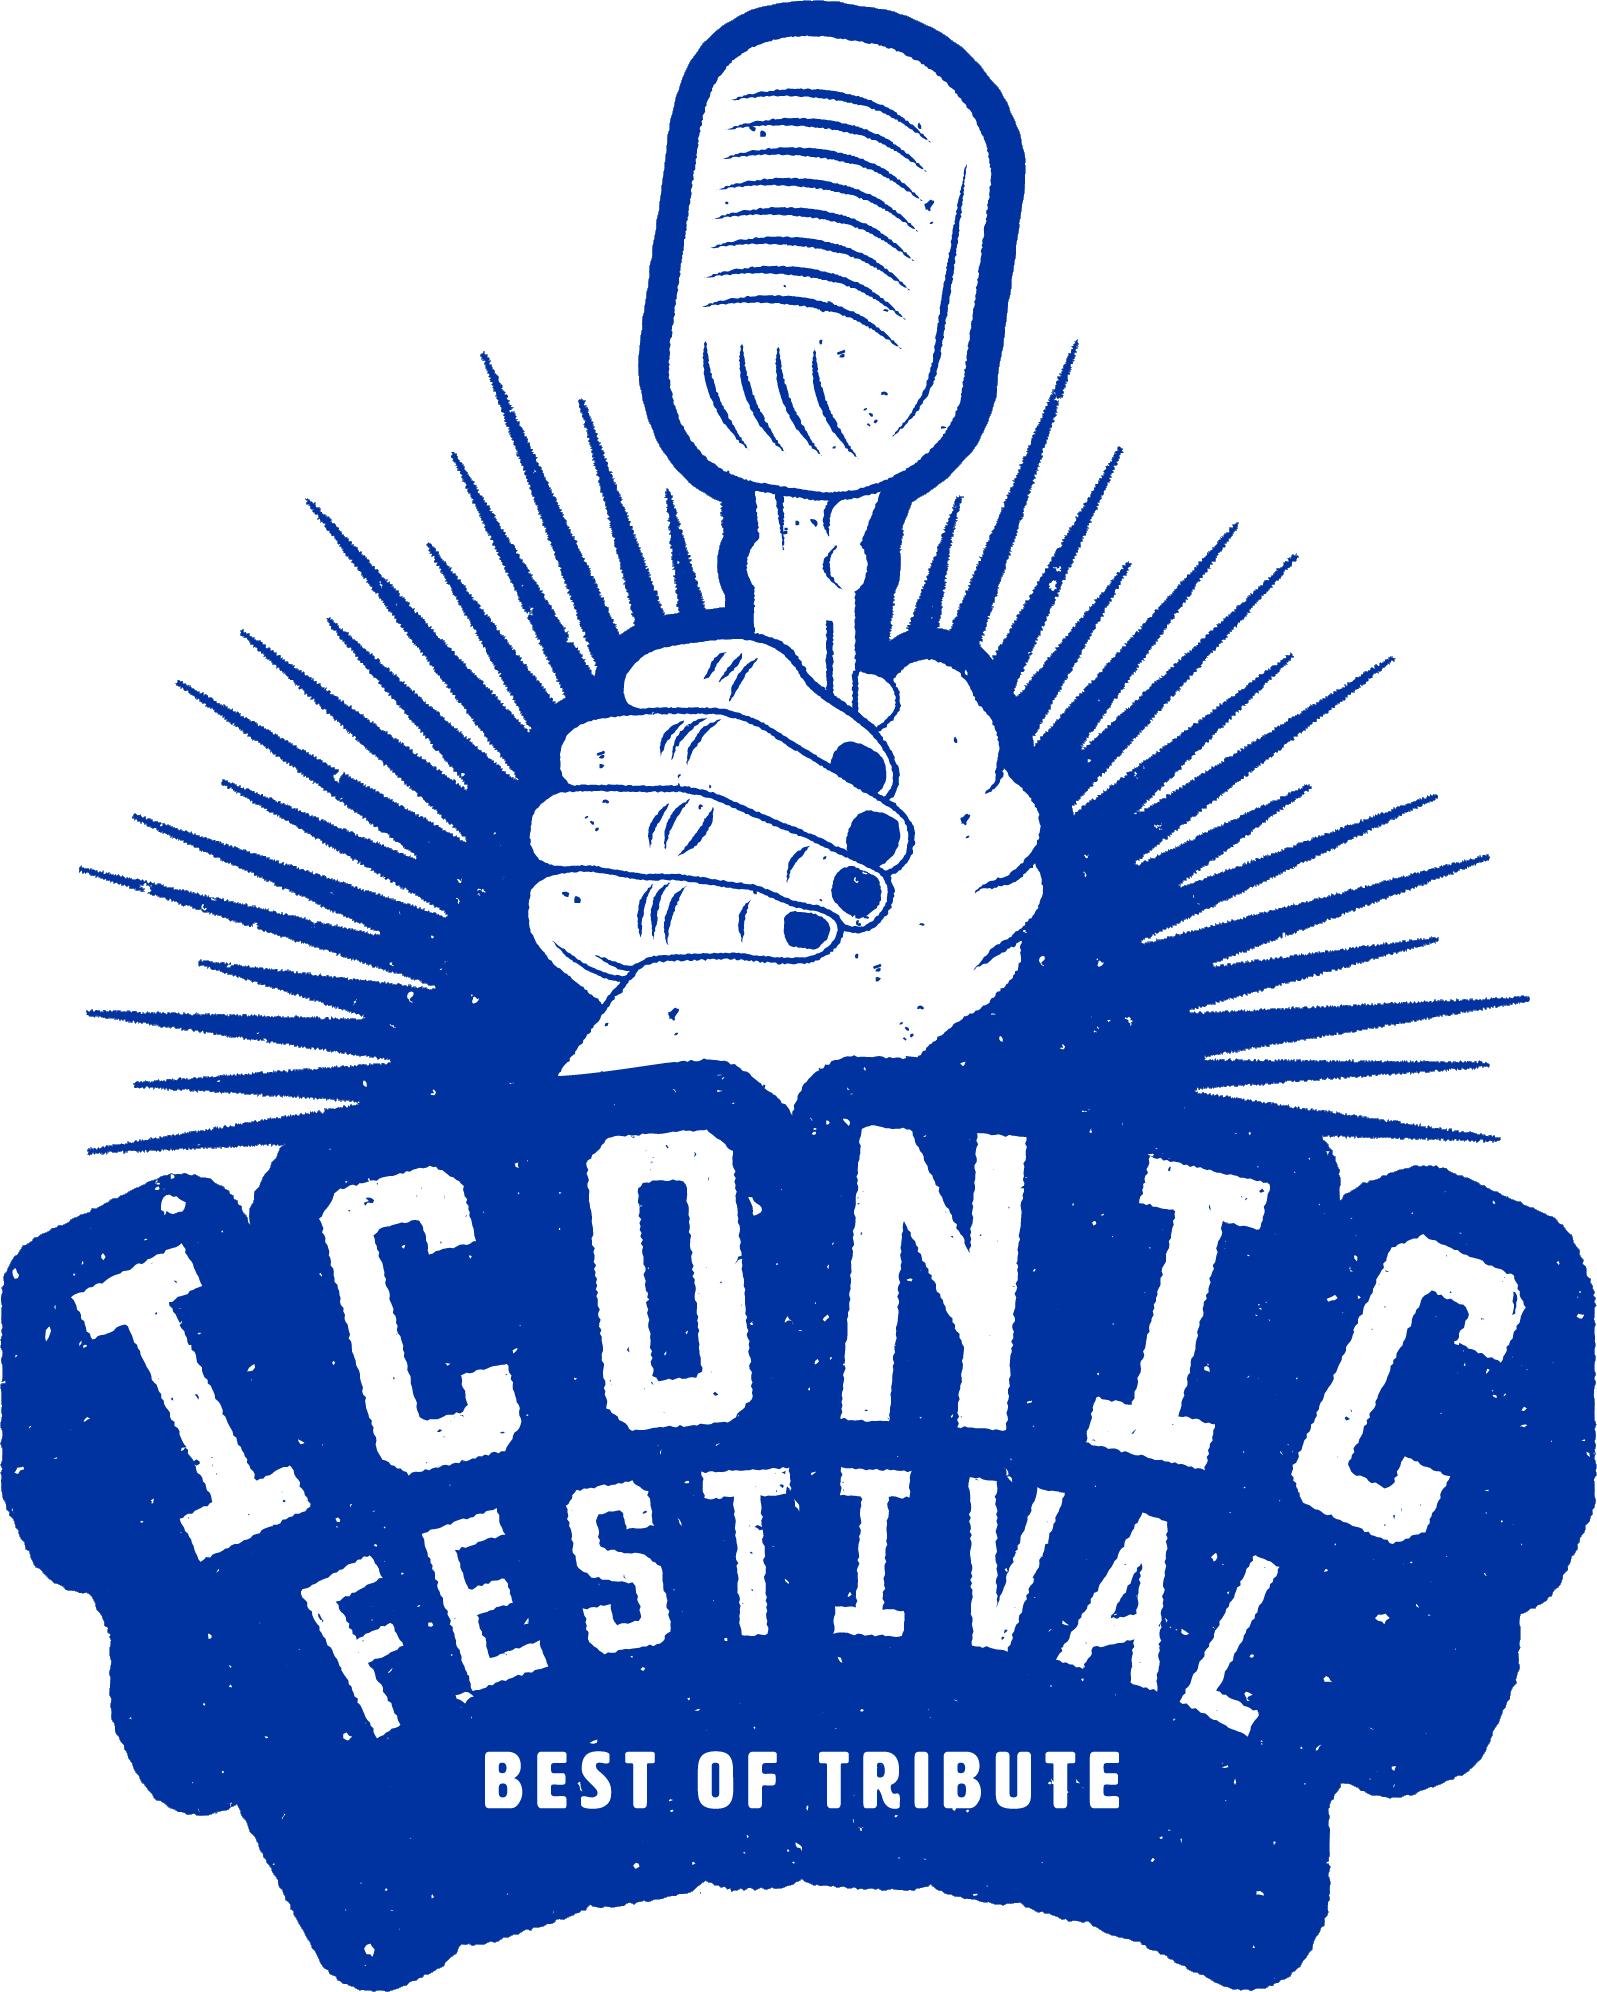 https://iconicfestival.nl/wp-content/uploads/2021/06/Logo_IconicFest_Blauw-wit.png